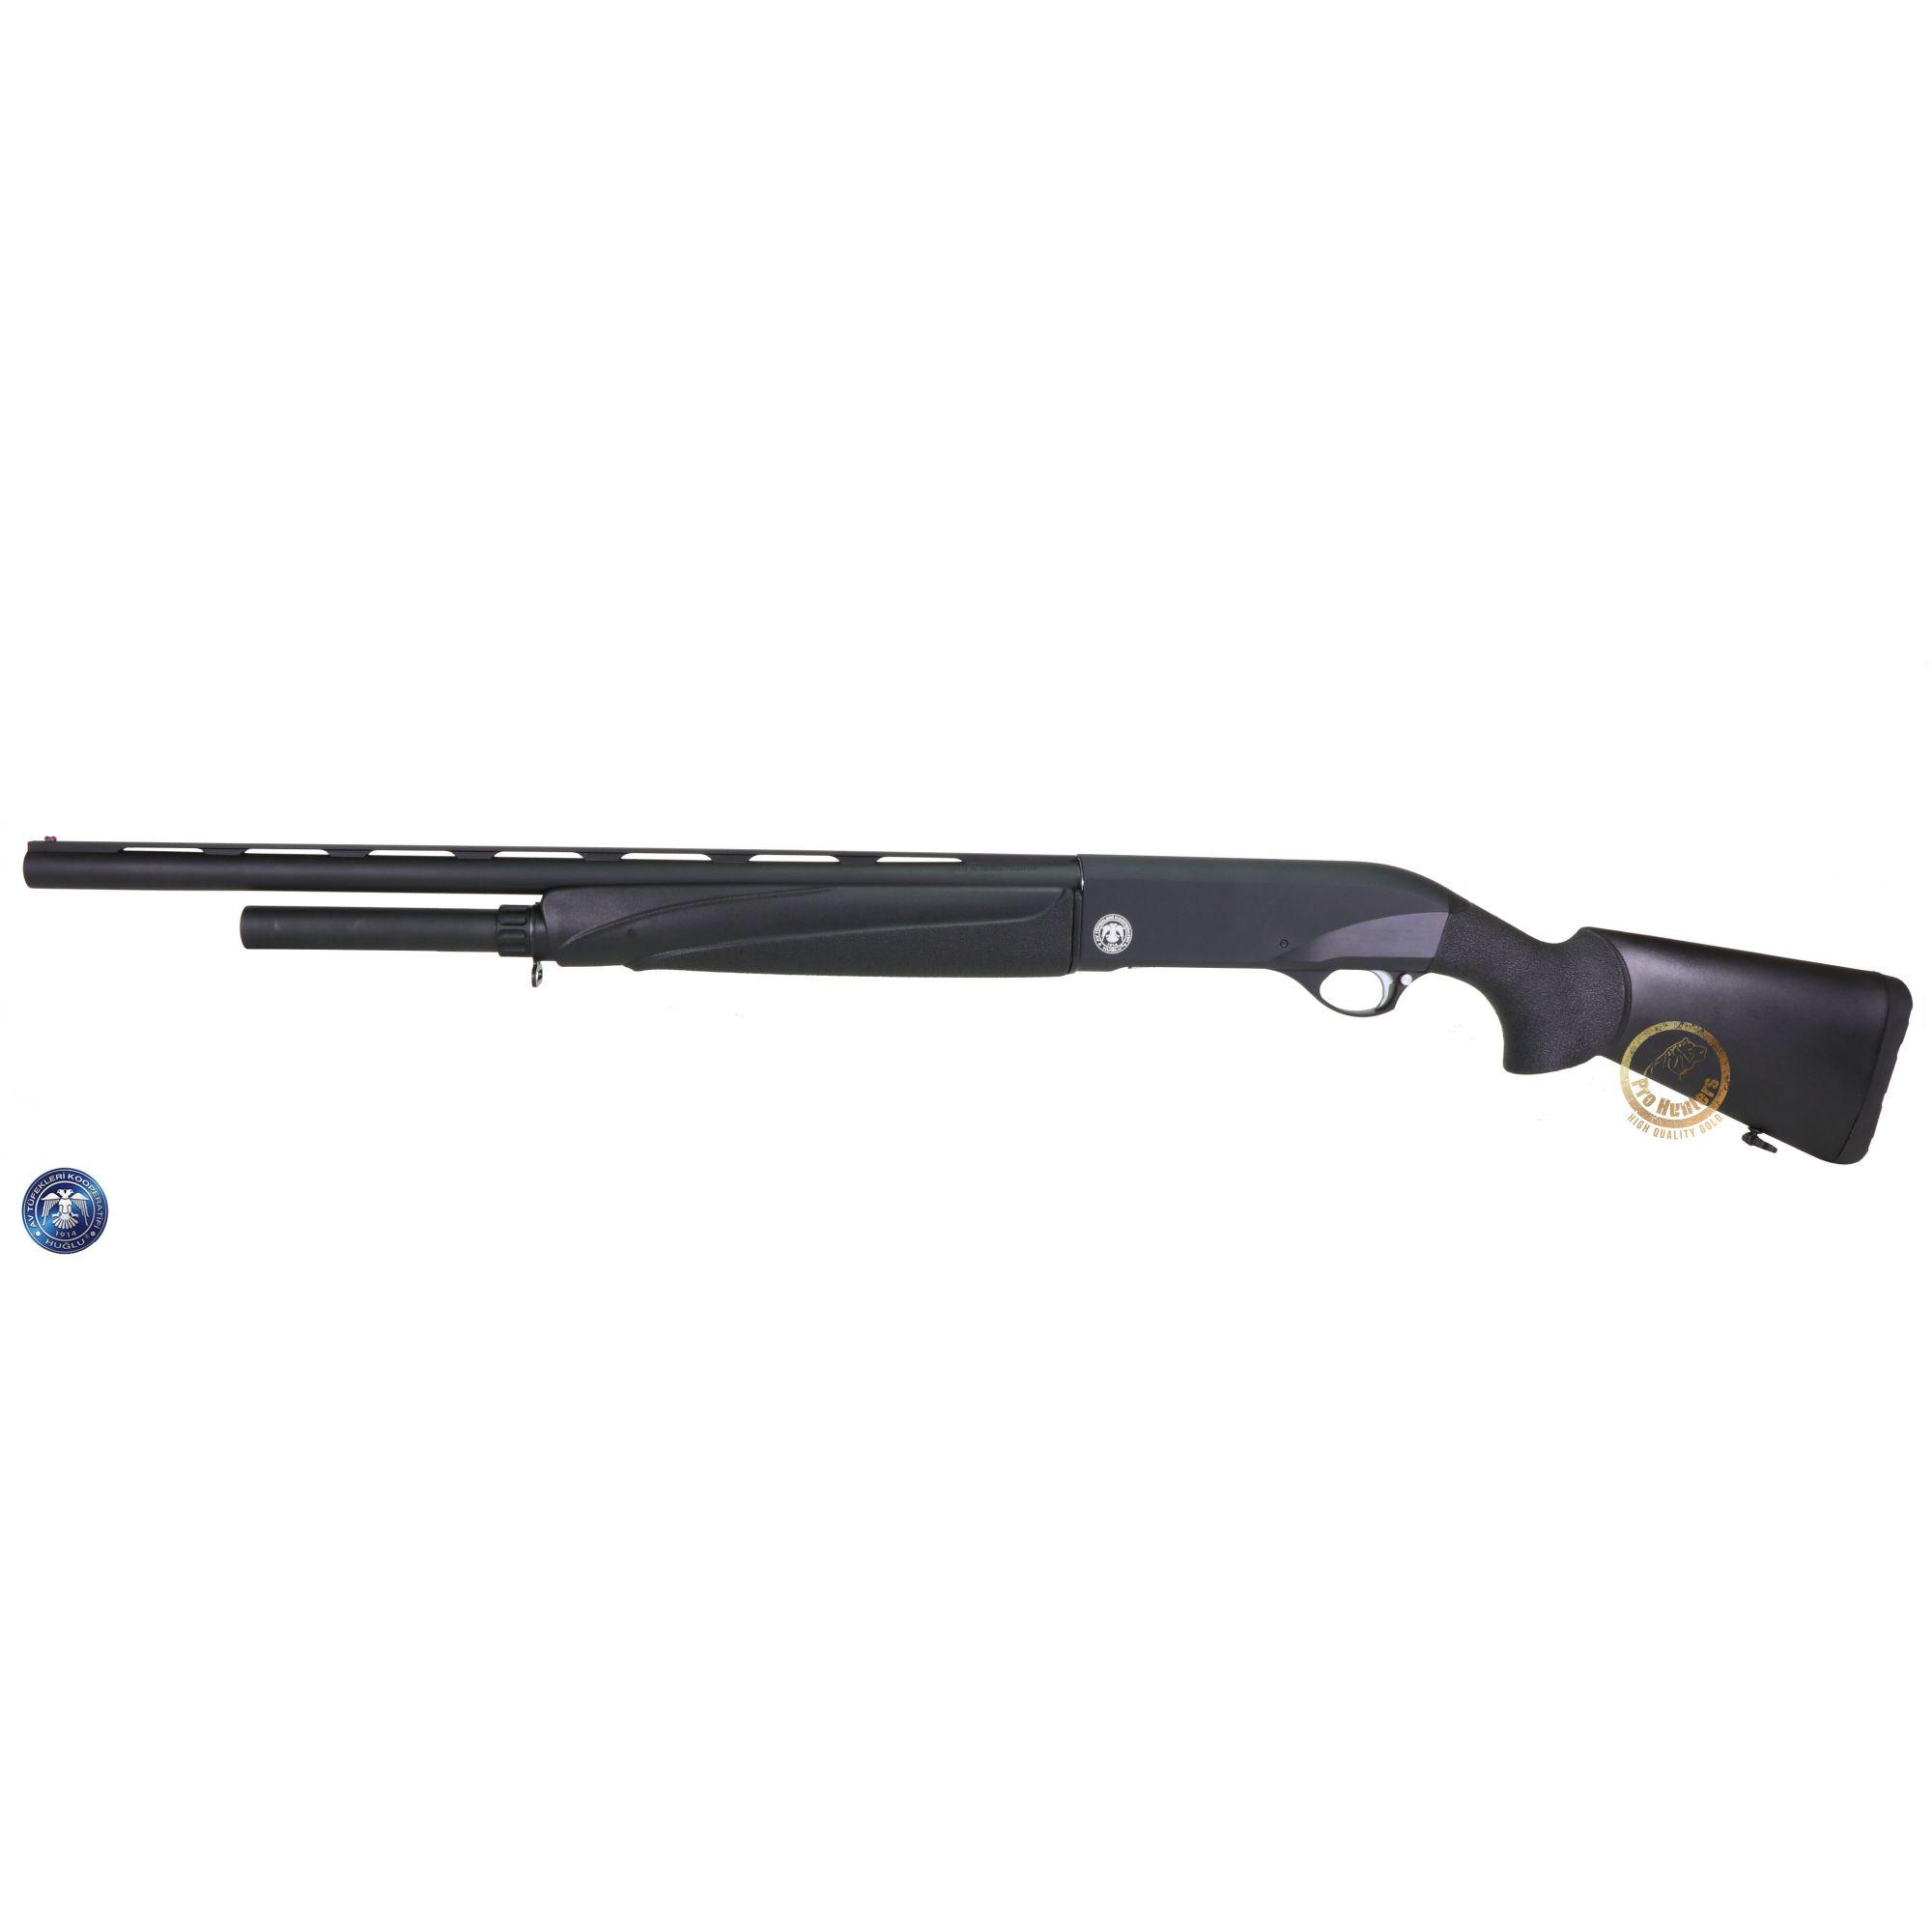 Espingarda Huglu GX812 M. Choke Black Plastic - Calibre 12GA